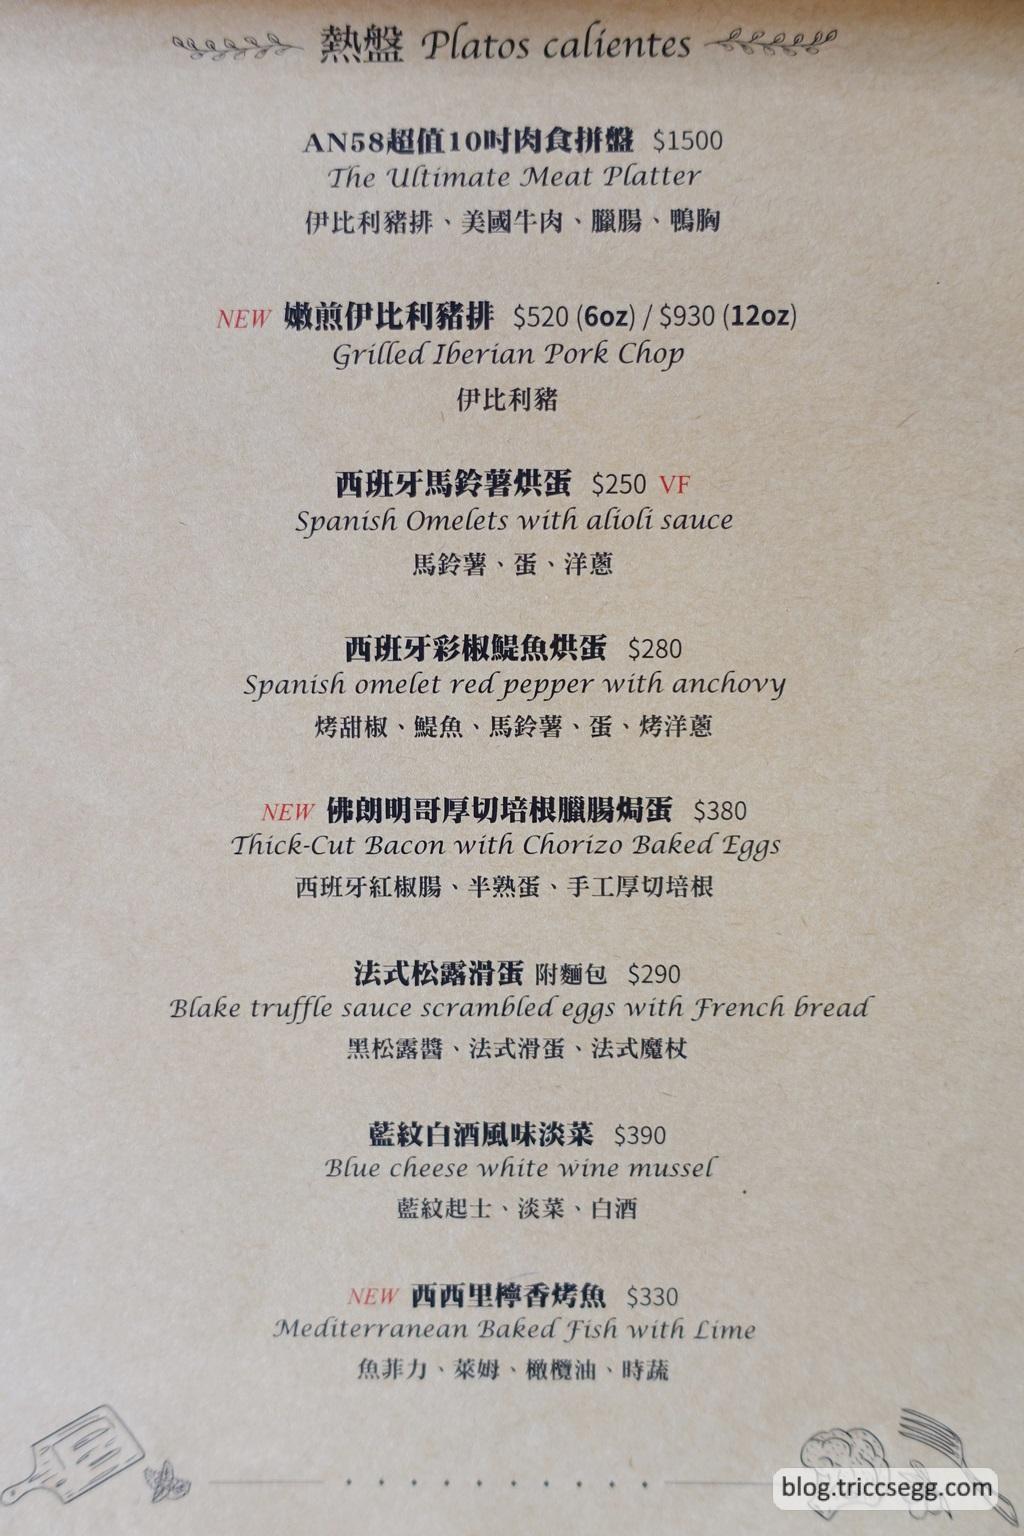 AN58歐陸小酒館菜單(6).jpg